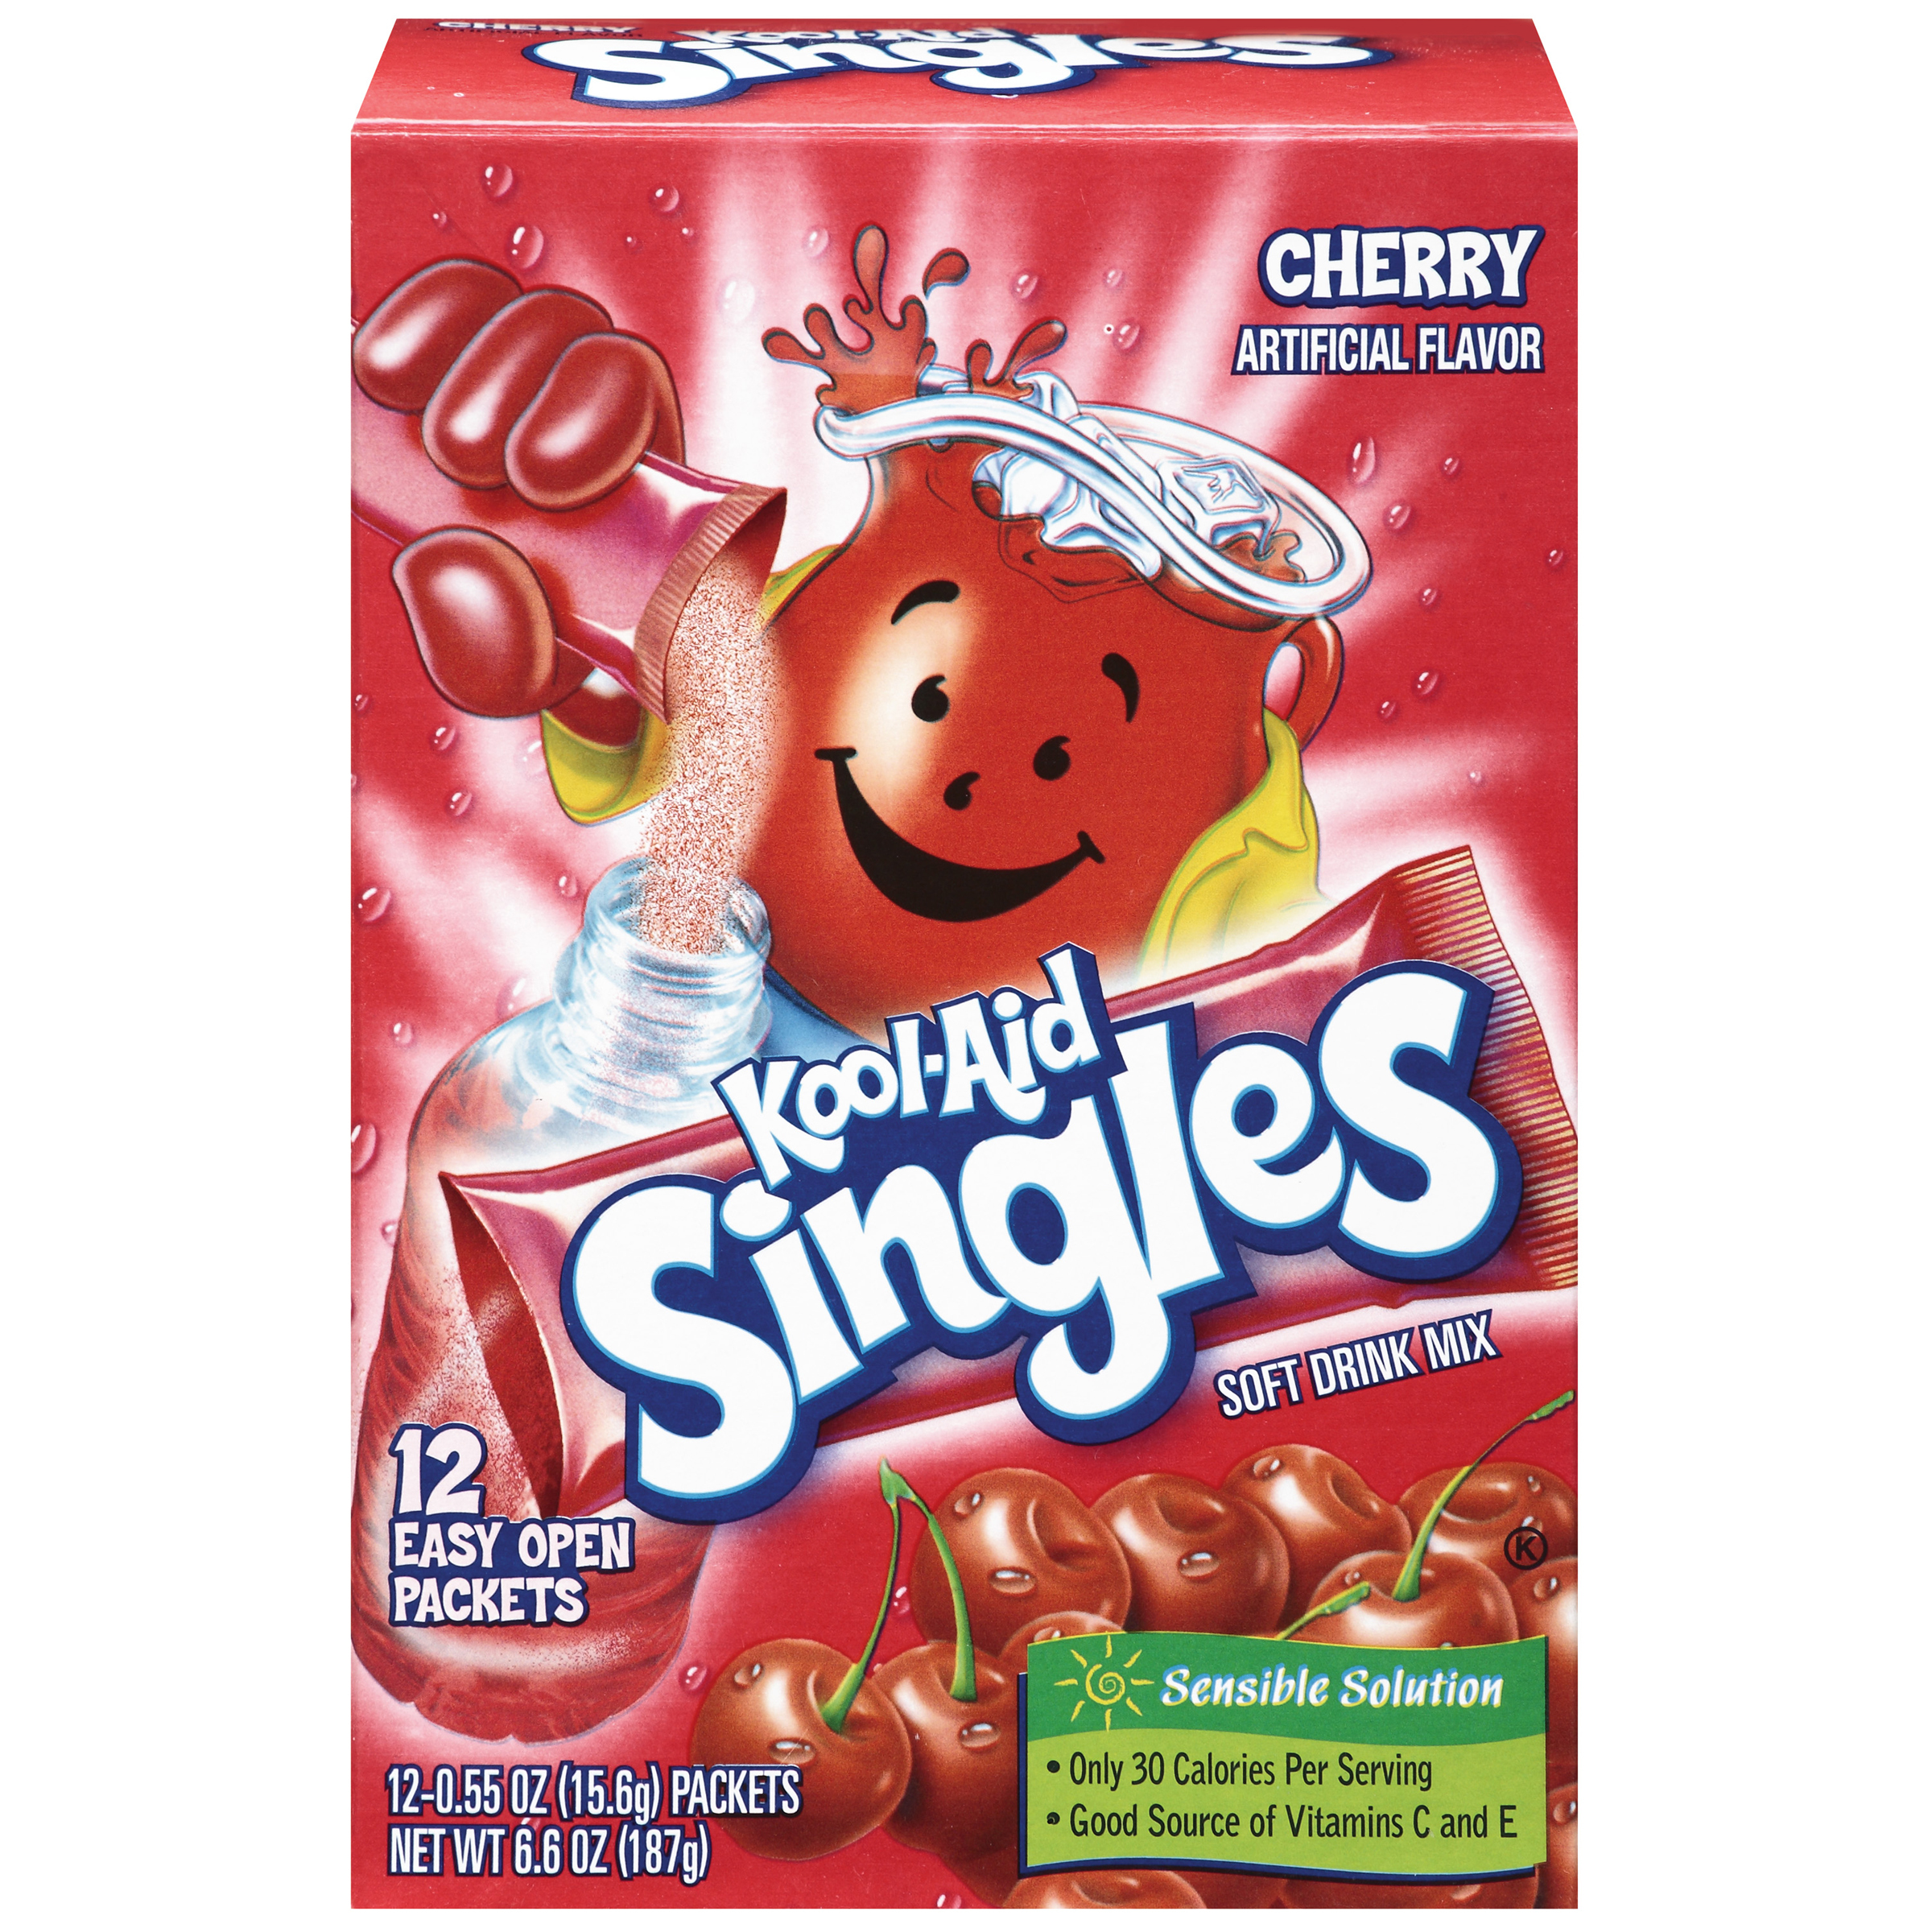 Kool-Aid Singles Cherry 12 Ct Soft Drink Mix 6.6 Oz Box image